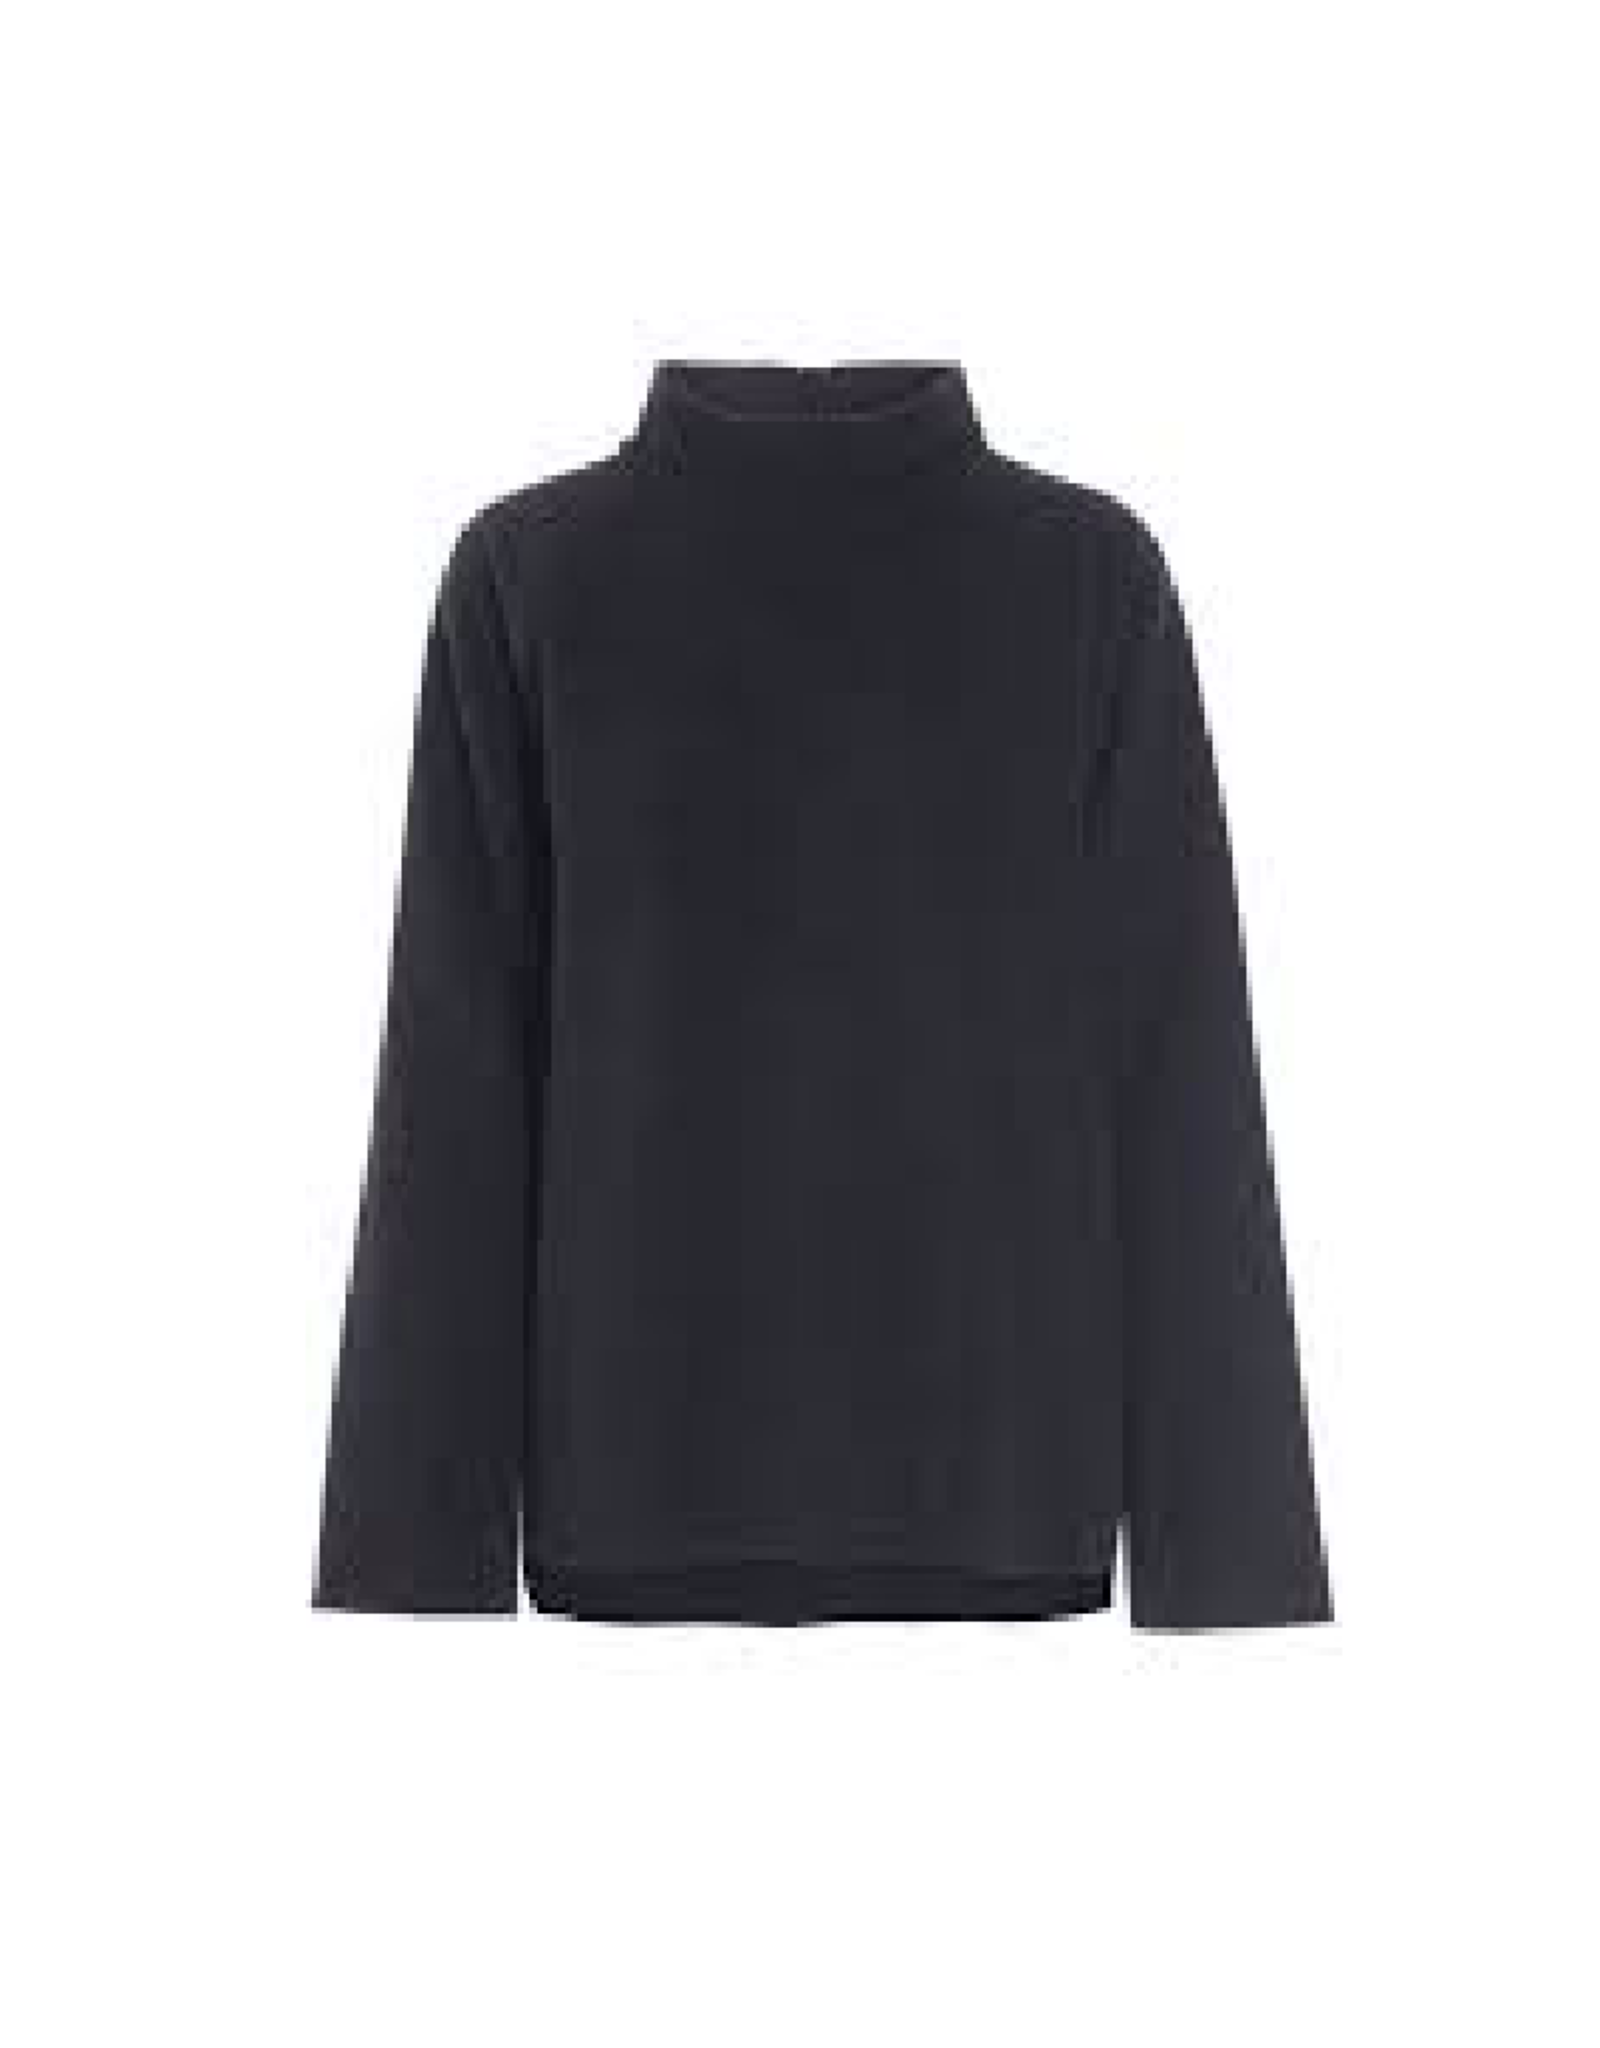 Henriette Steffensen Fleece Mock Neck Sweater